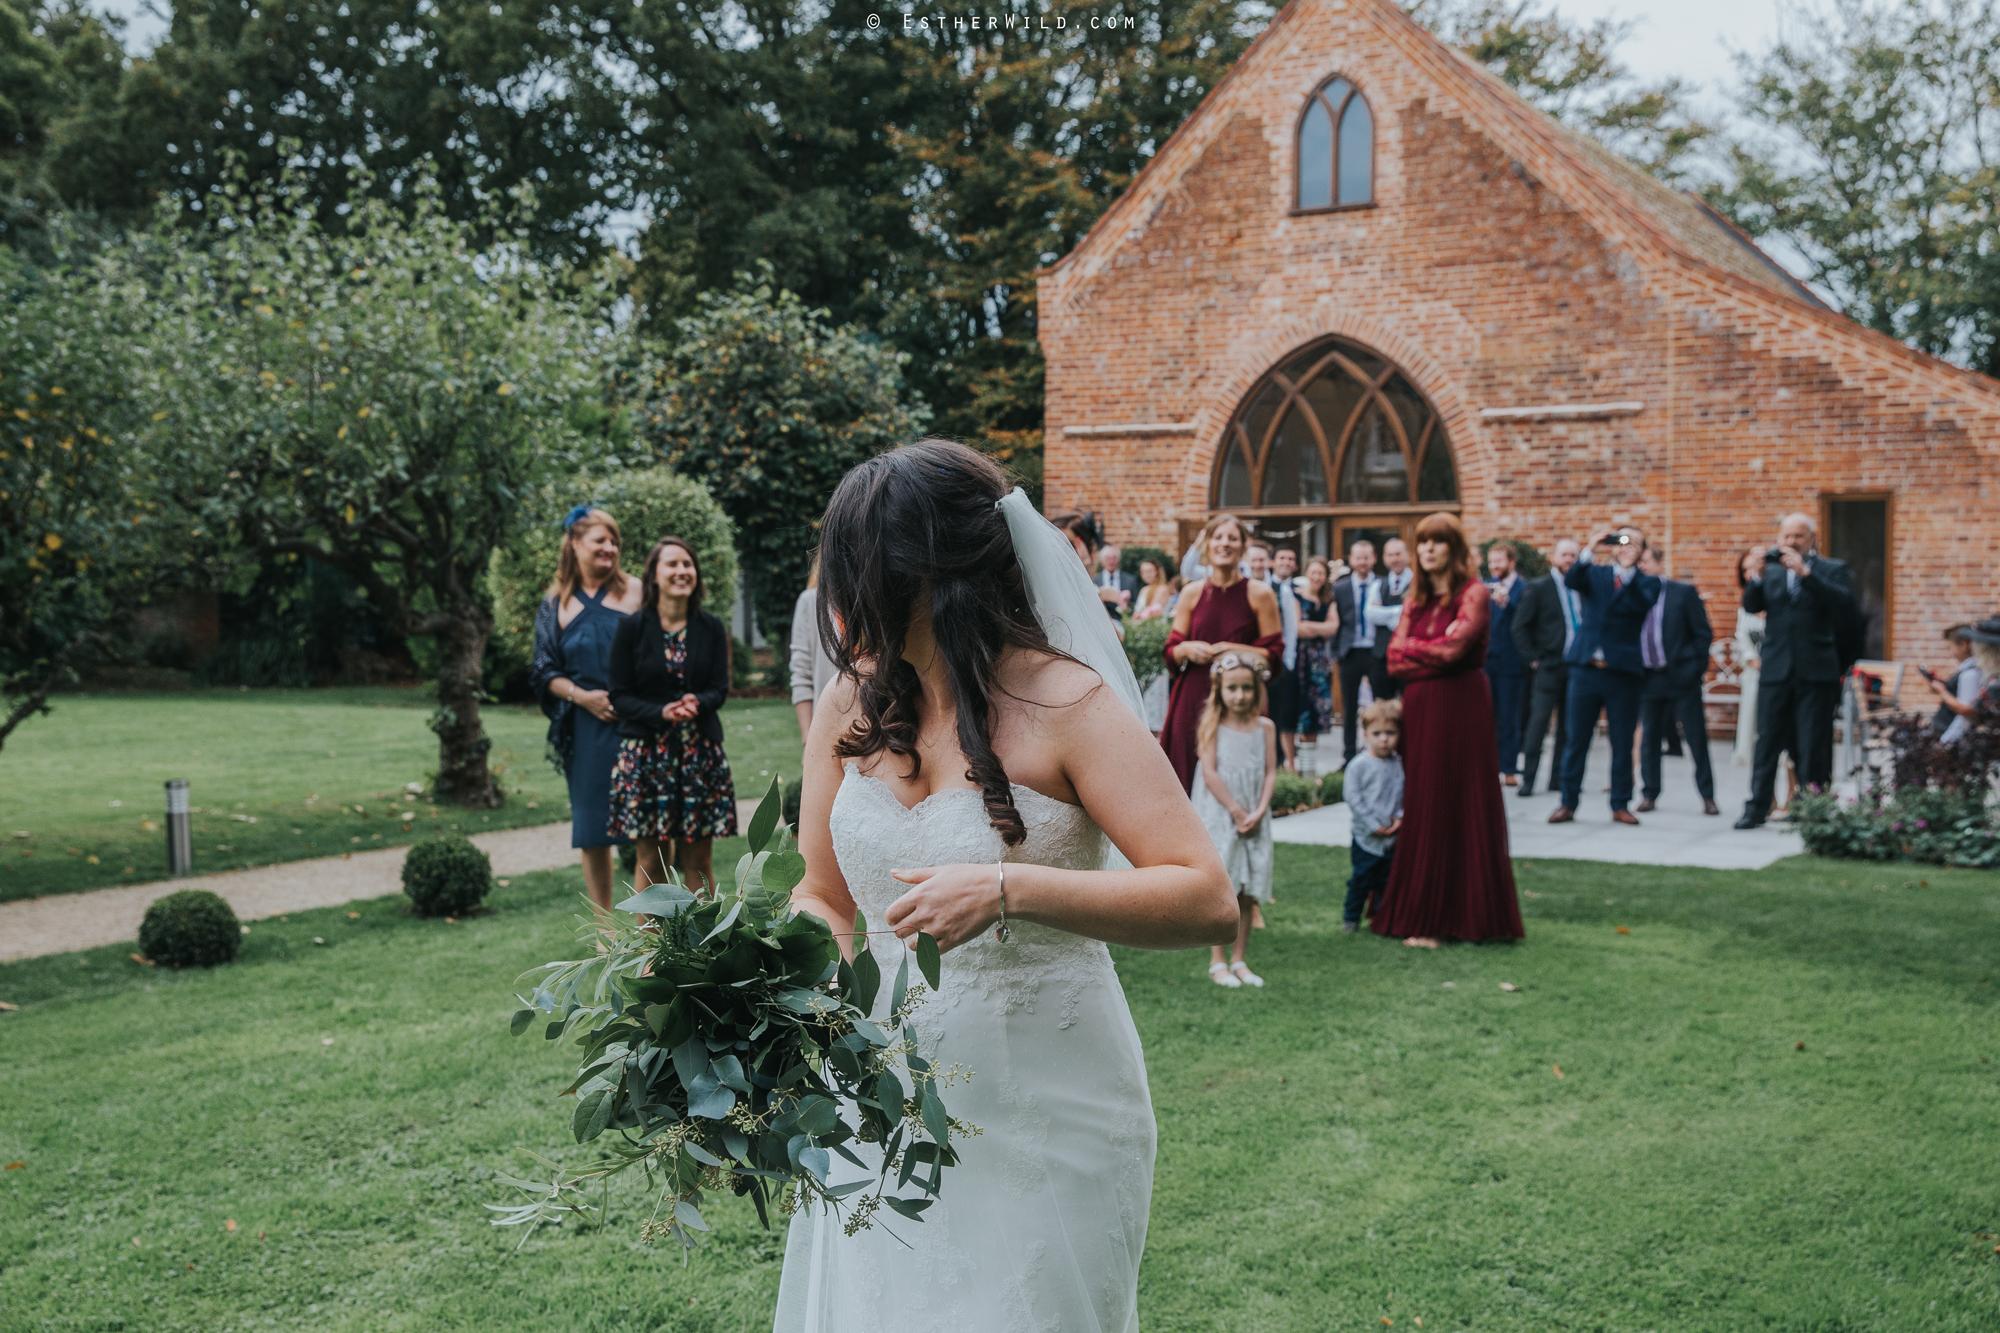 Reading_Room_Weddings_Alby_Norwich_Photographer_Esther_Wild_IMG_1613.jpg